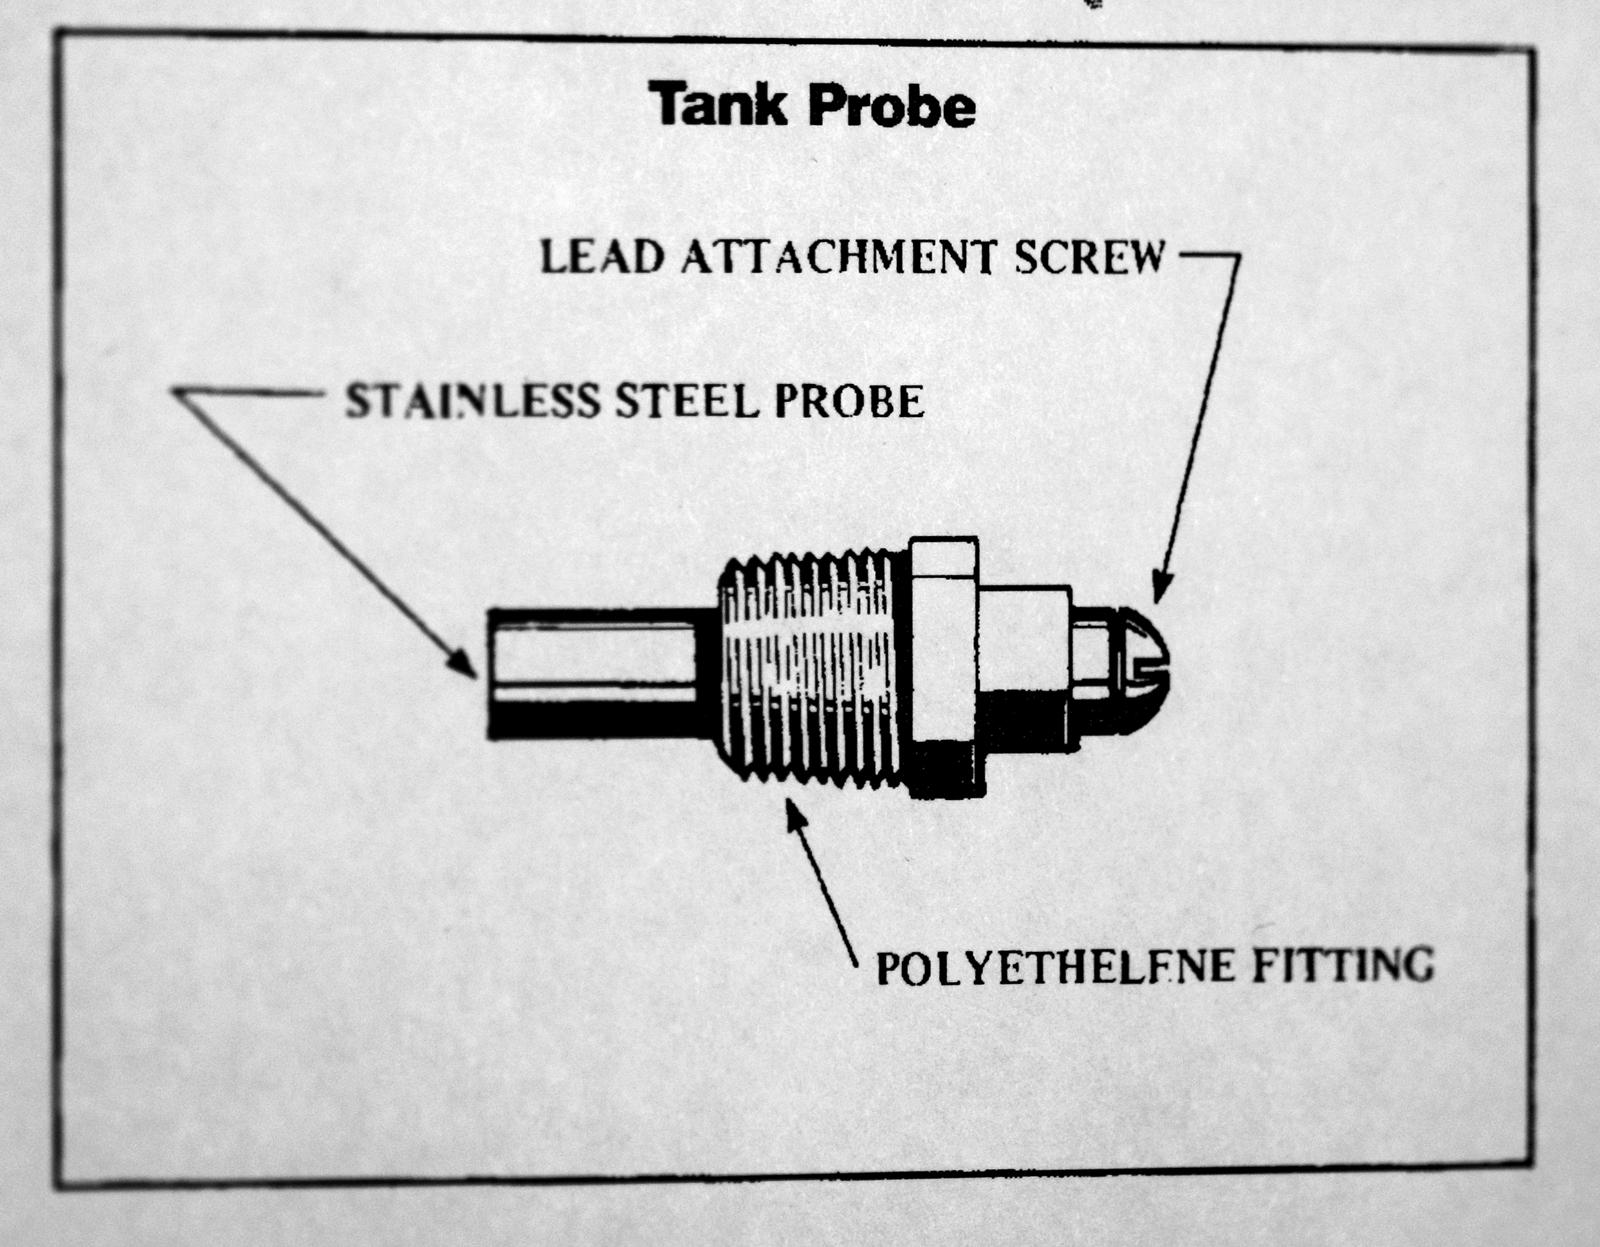 Click image for larger version  Name:Tank-Probe-Diagram-DSC00802.jpg Views:63 Size:995.5 KB ID:71497